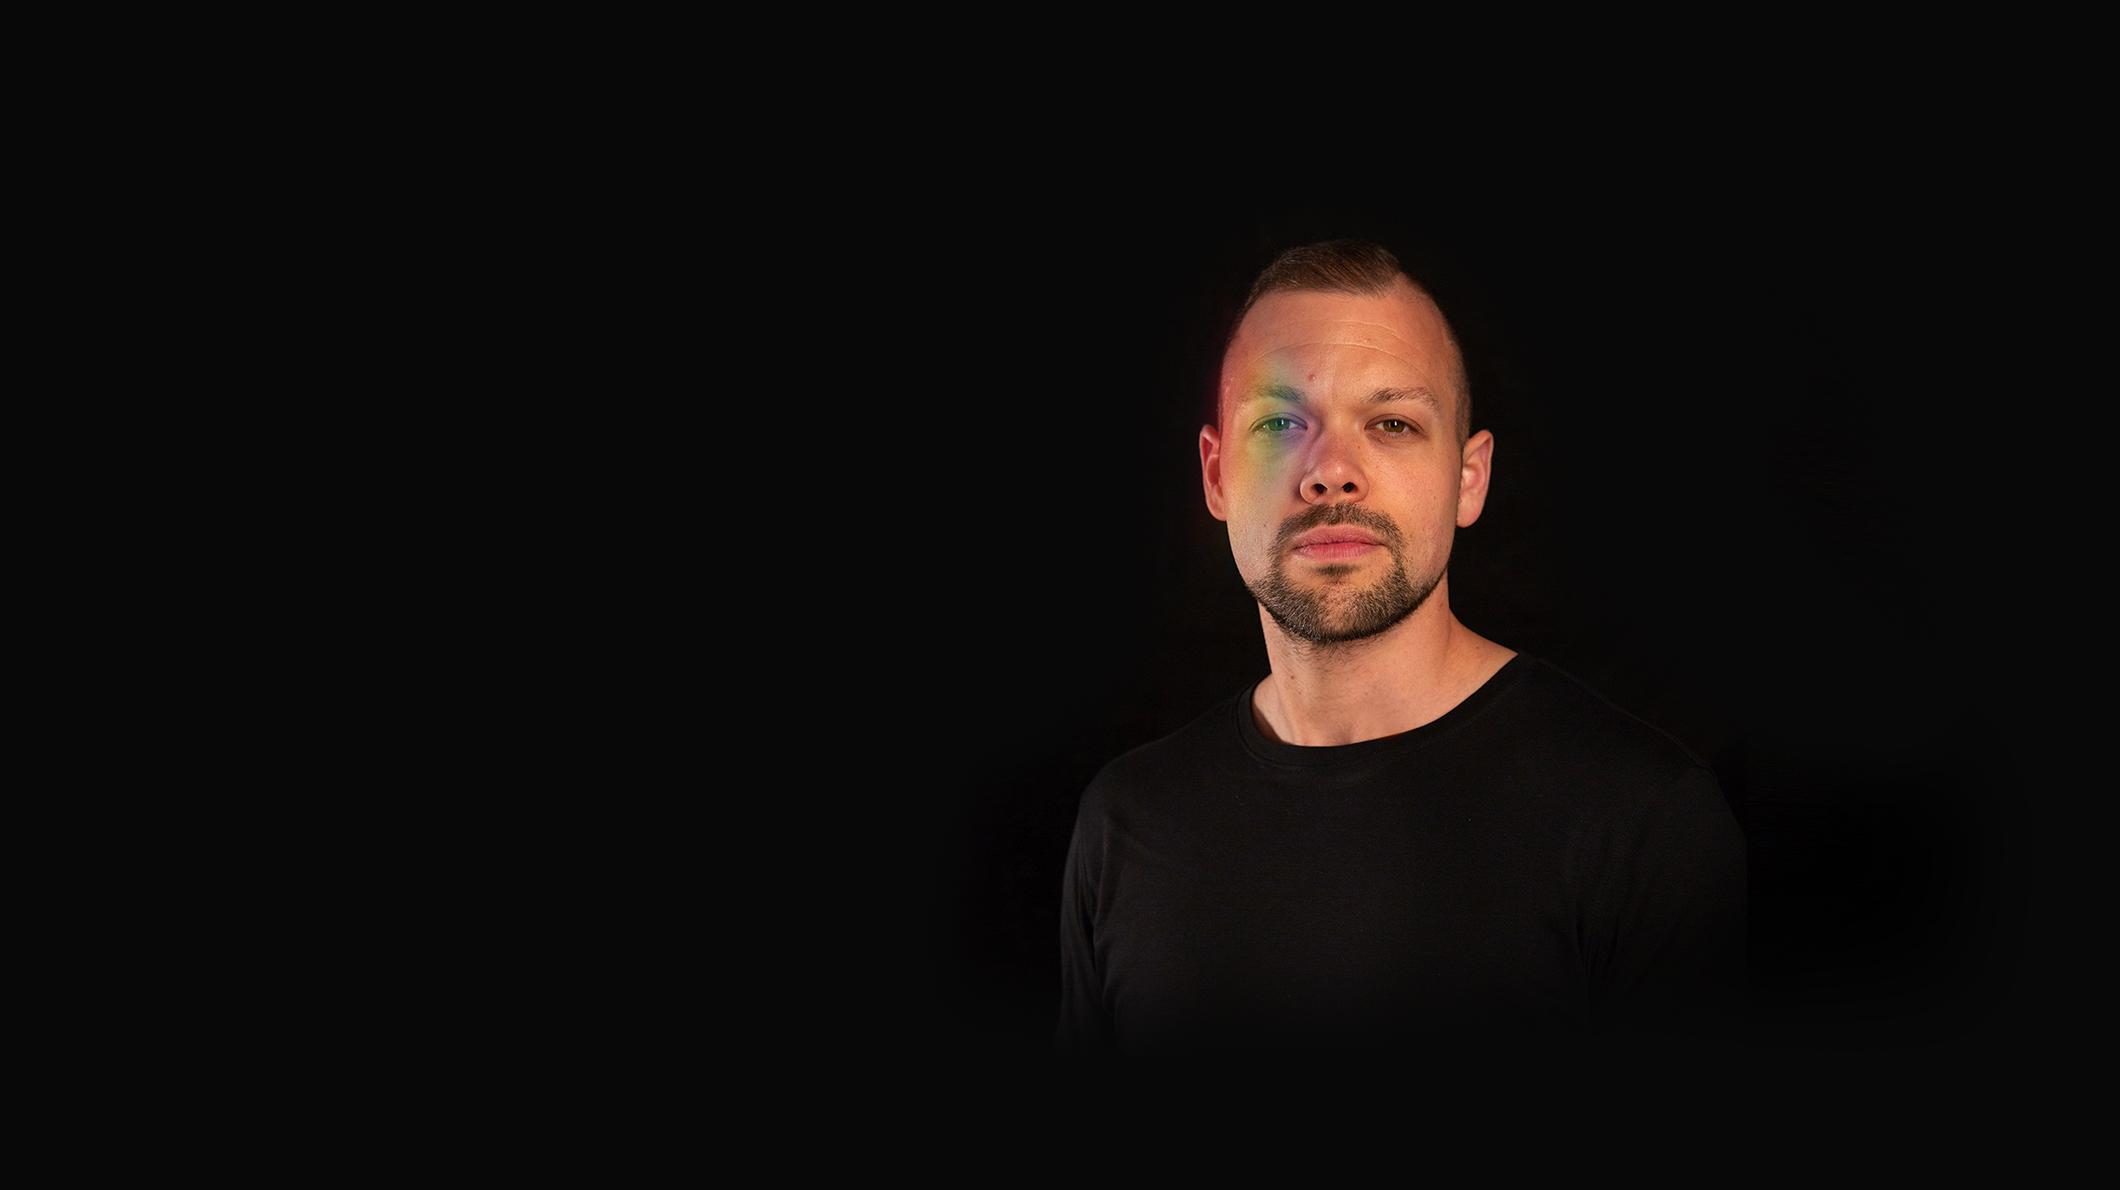 Video of Travis